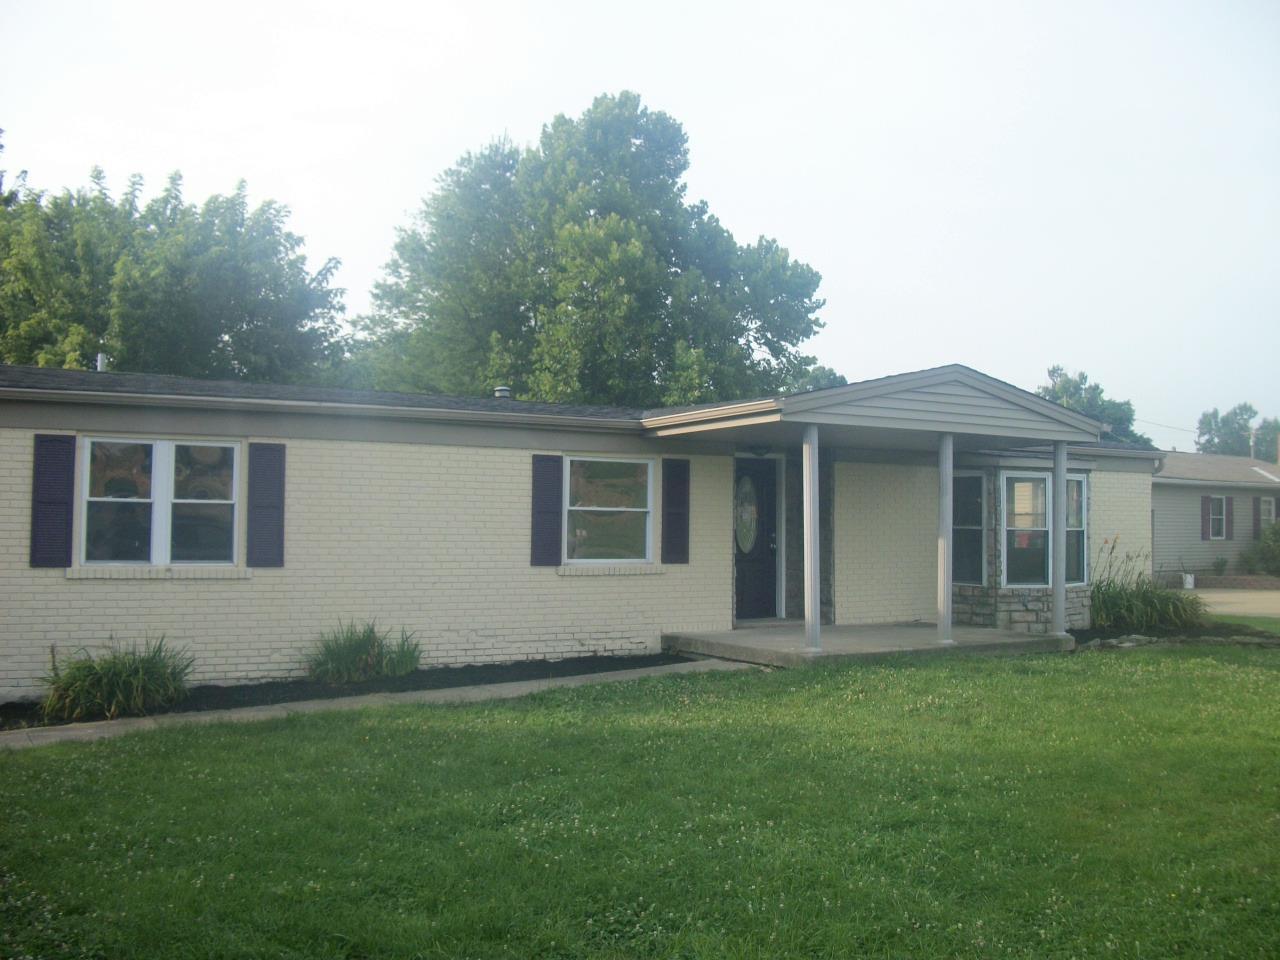 8168 E Bend Rd, Burlington, KY 41005